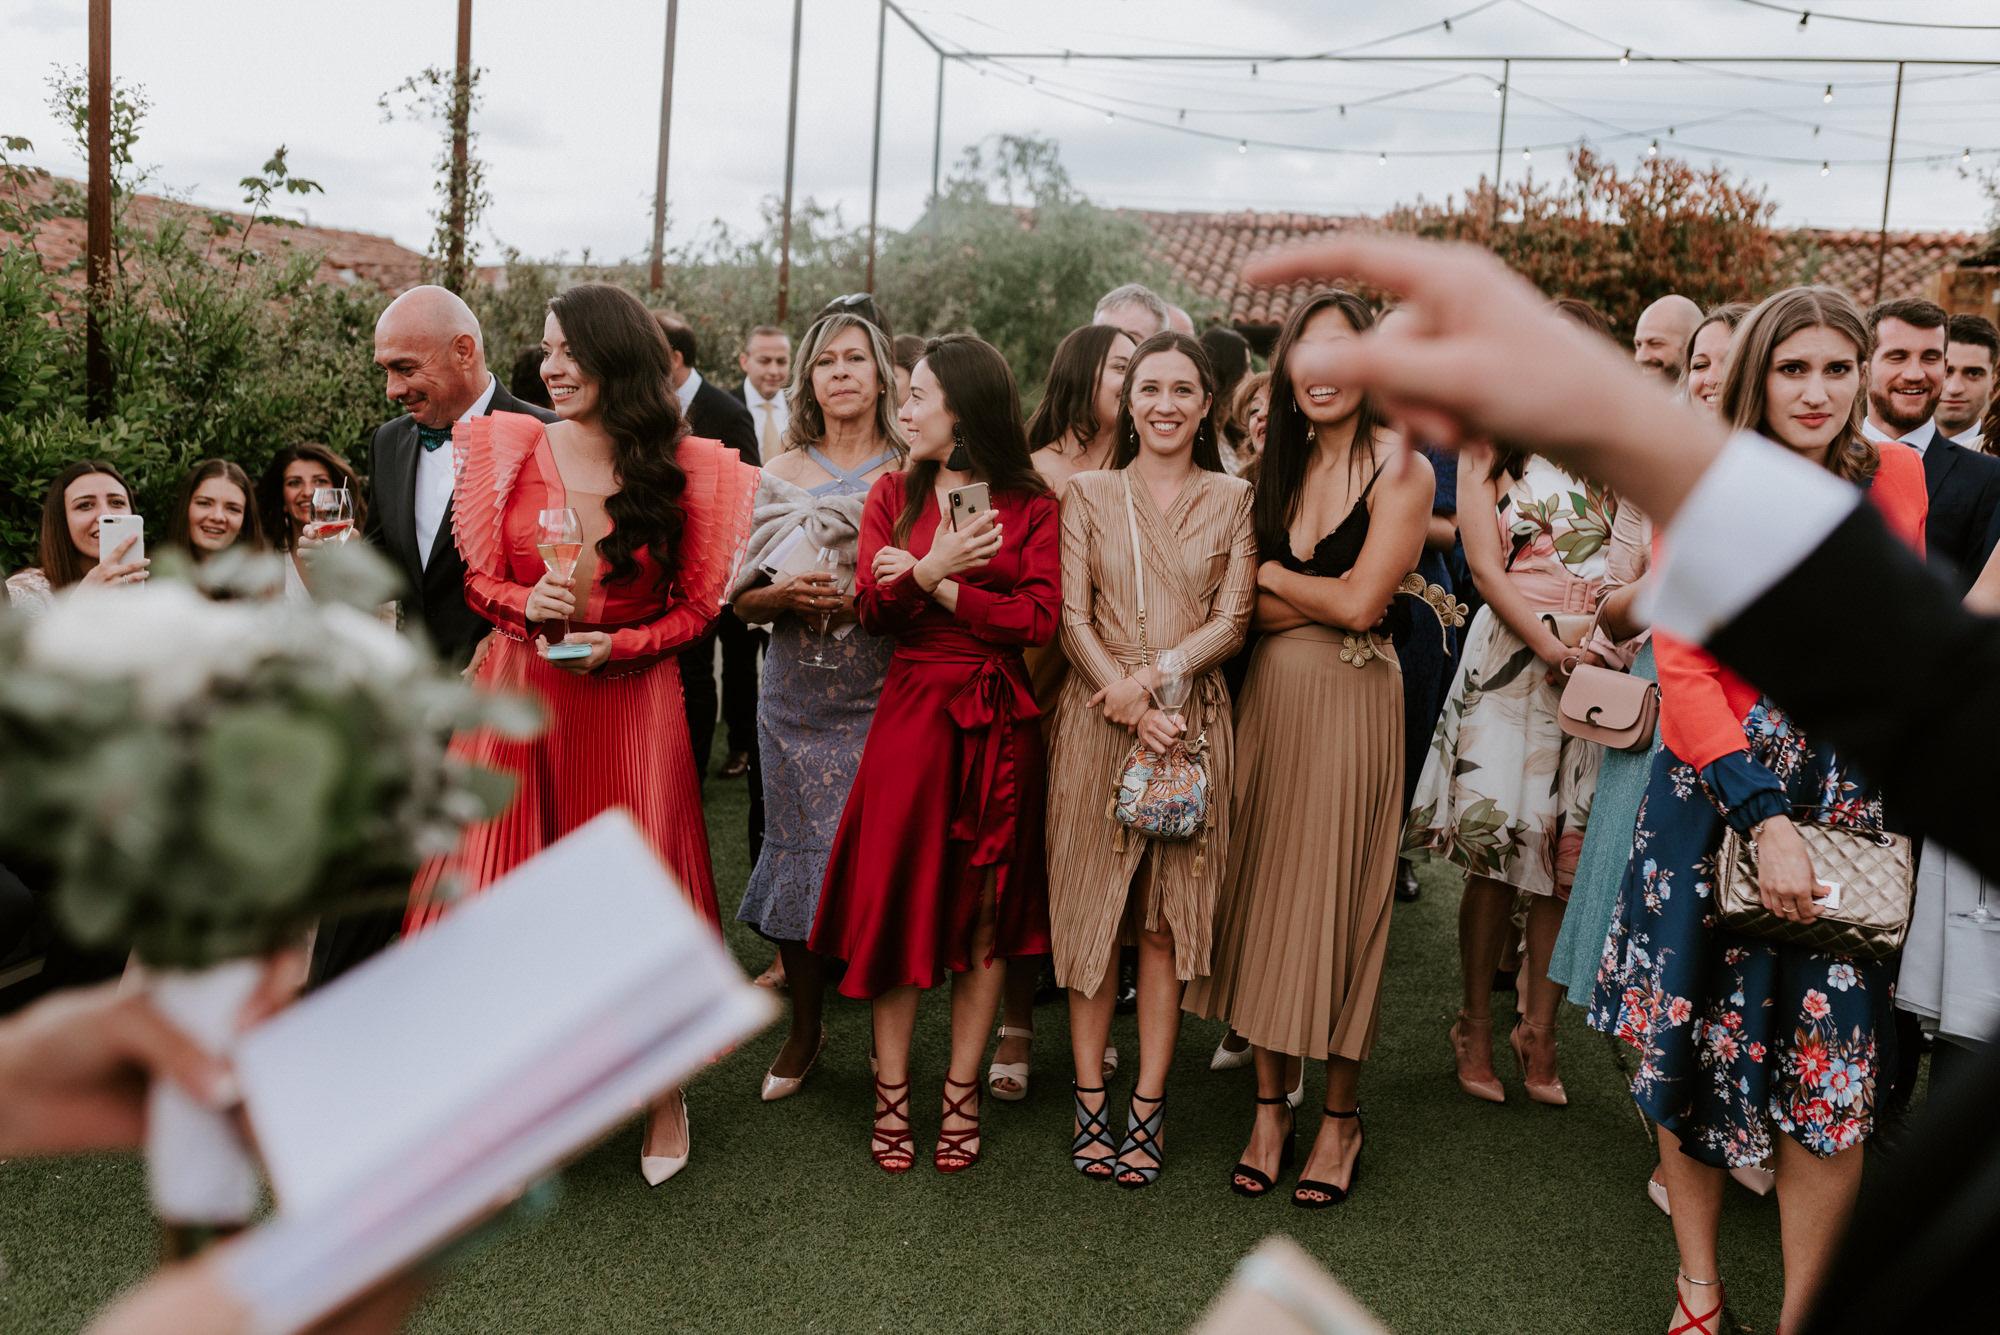 FOTO+PHOTO+BODA+WEDDING+ITALIA+ITALY+MAURICIO+GARAY+MAURICIOGARAY+WEDDINPHOTOGRAPHER+FOTOGRAFODEBODA-1443.jpg